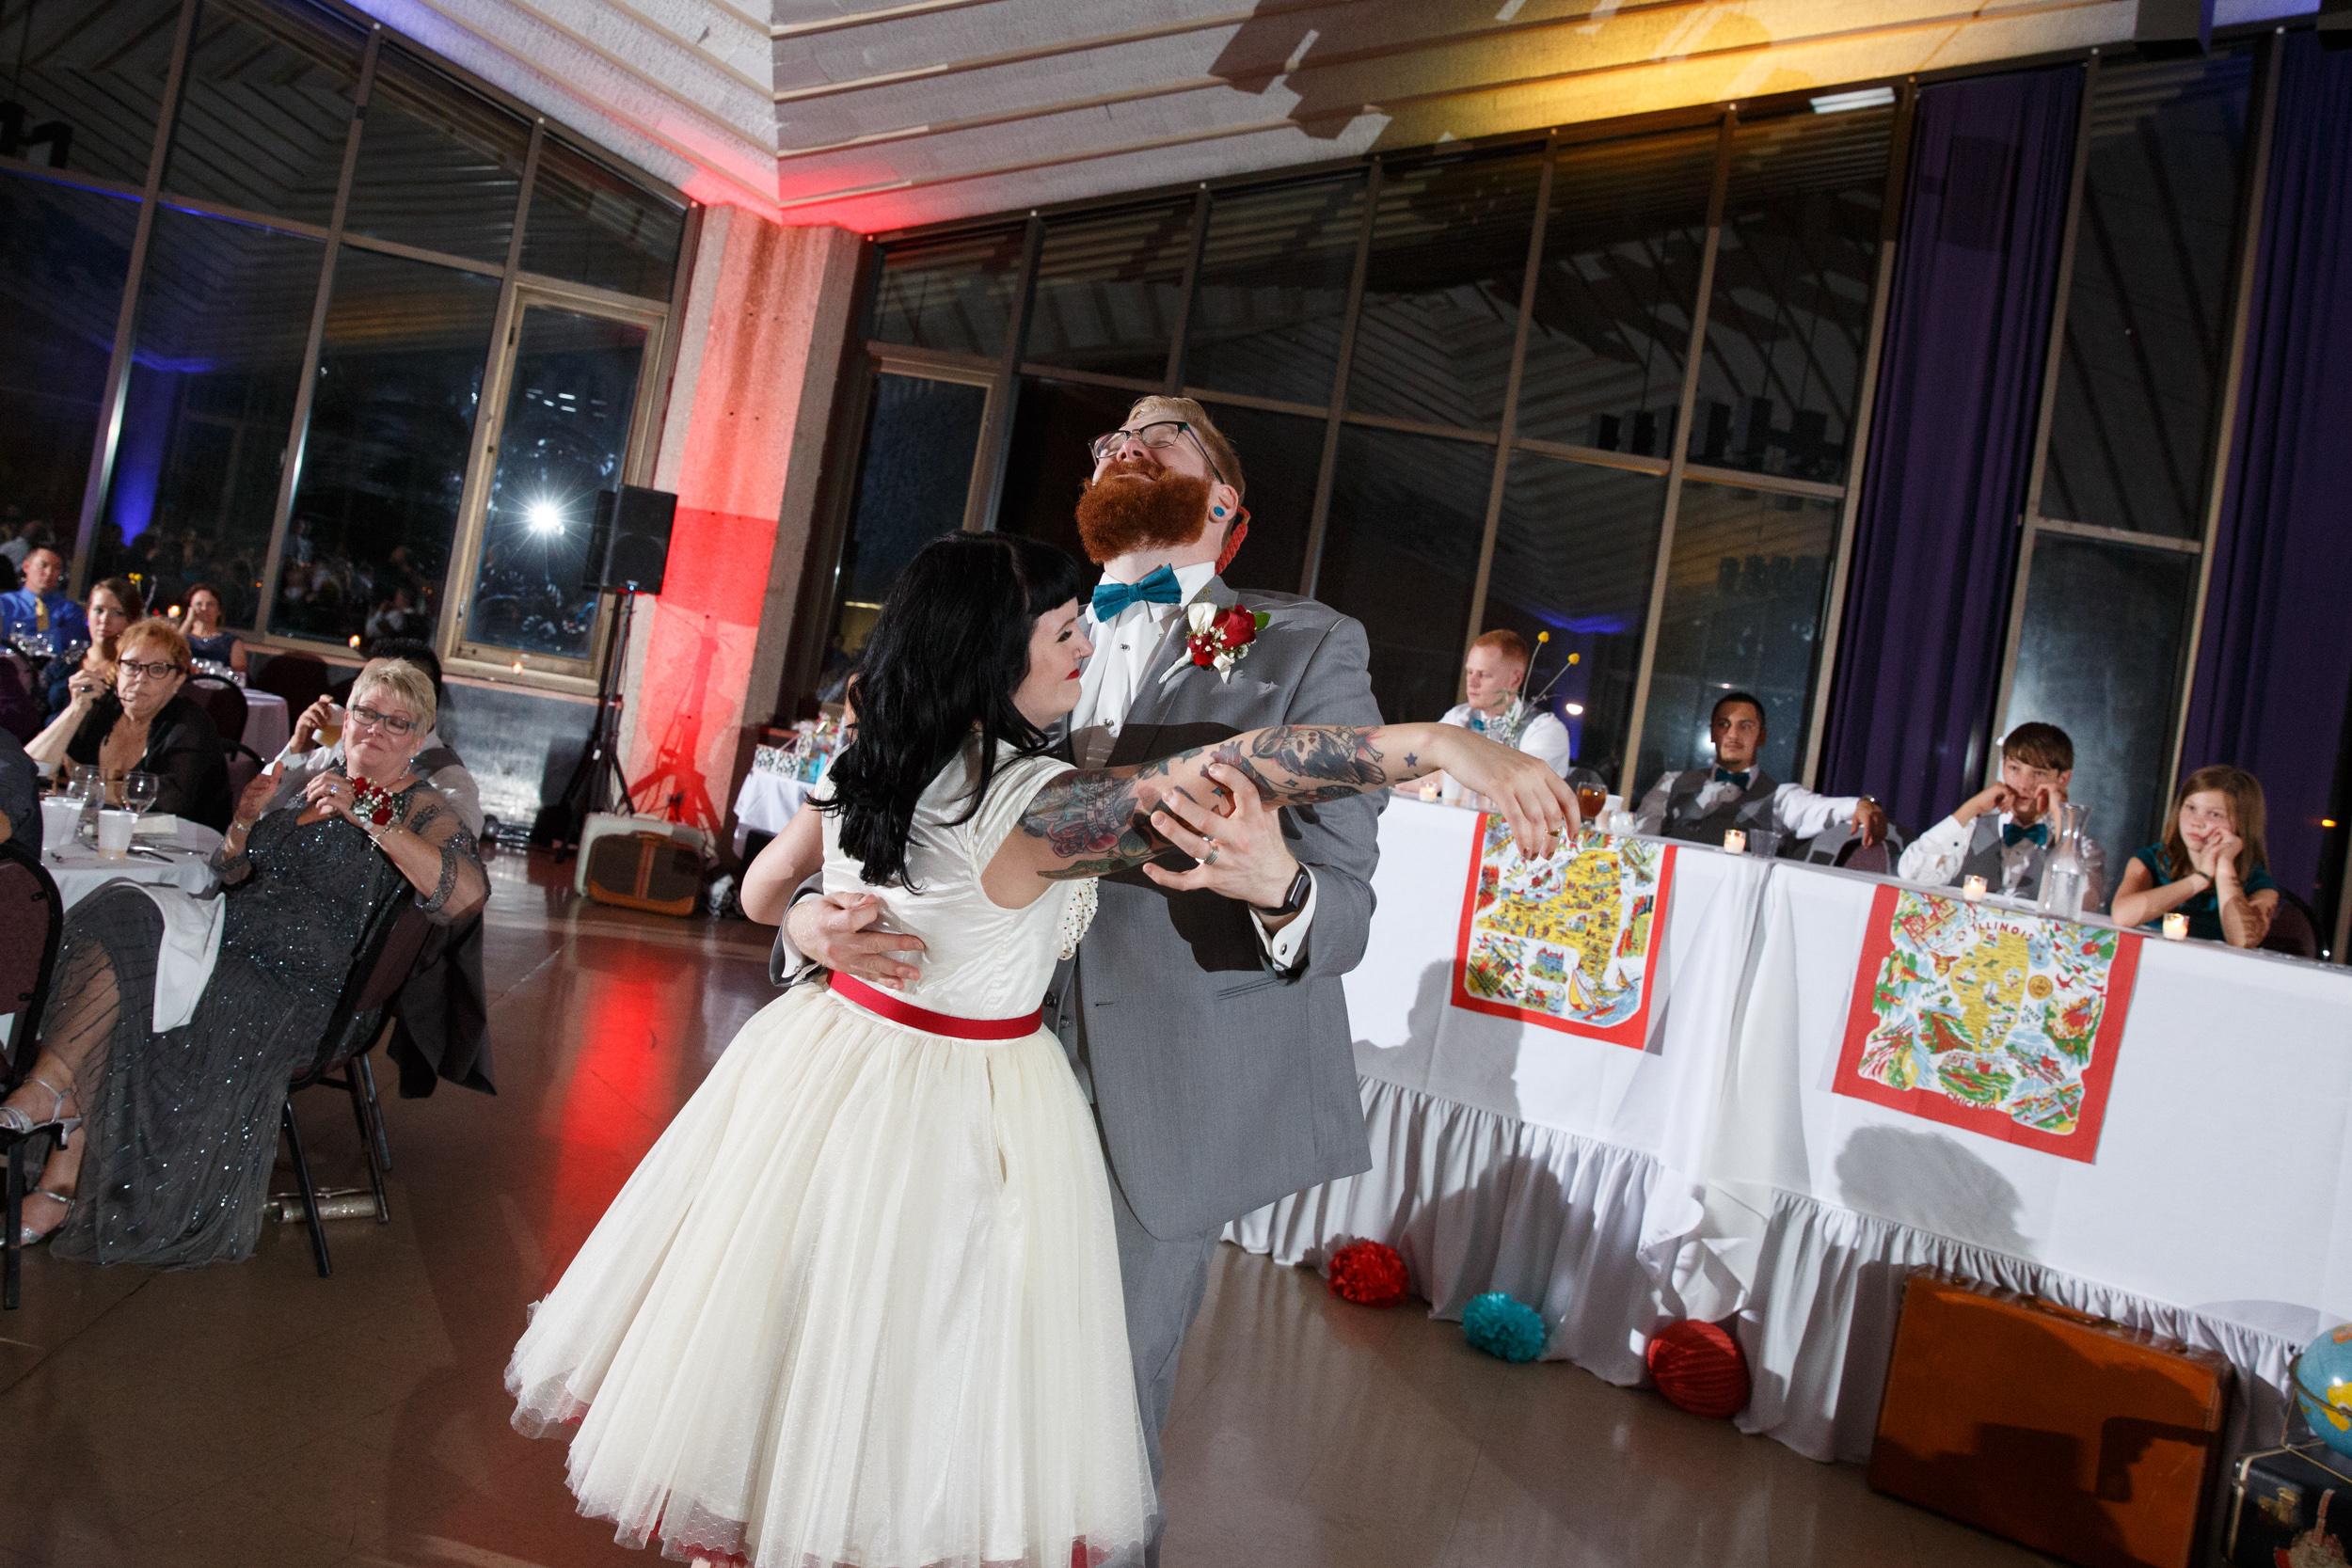 Christian & Sarah wedding photography by Brian milo-256.jpg